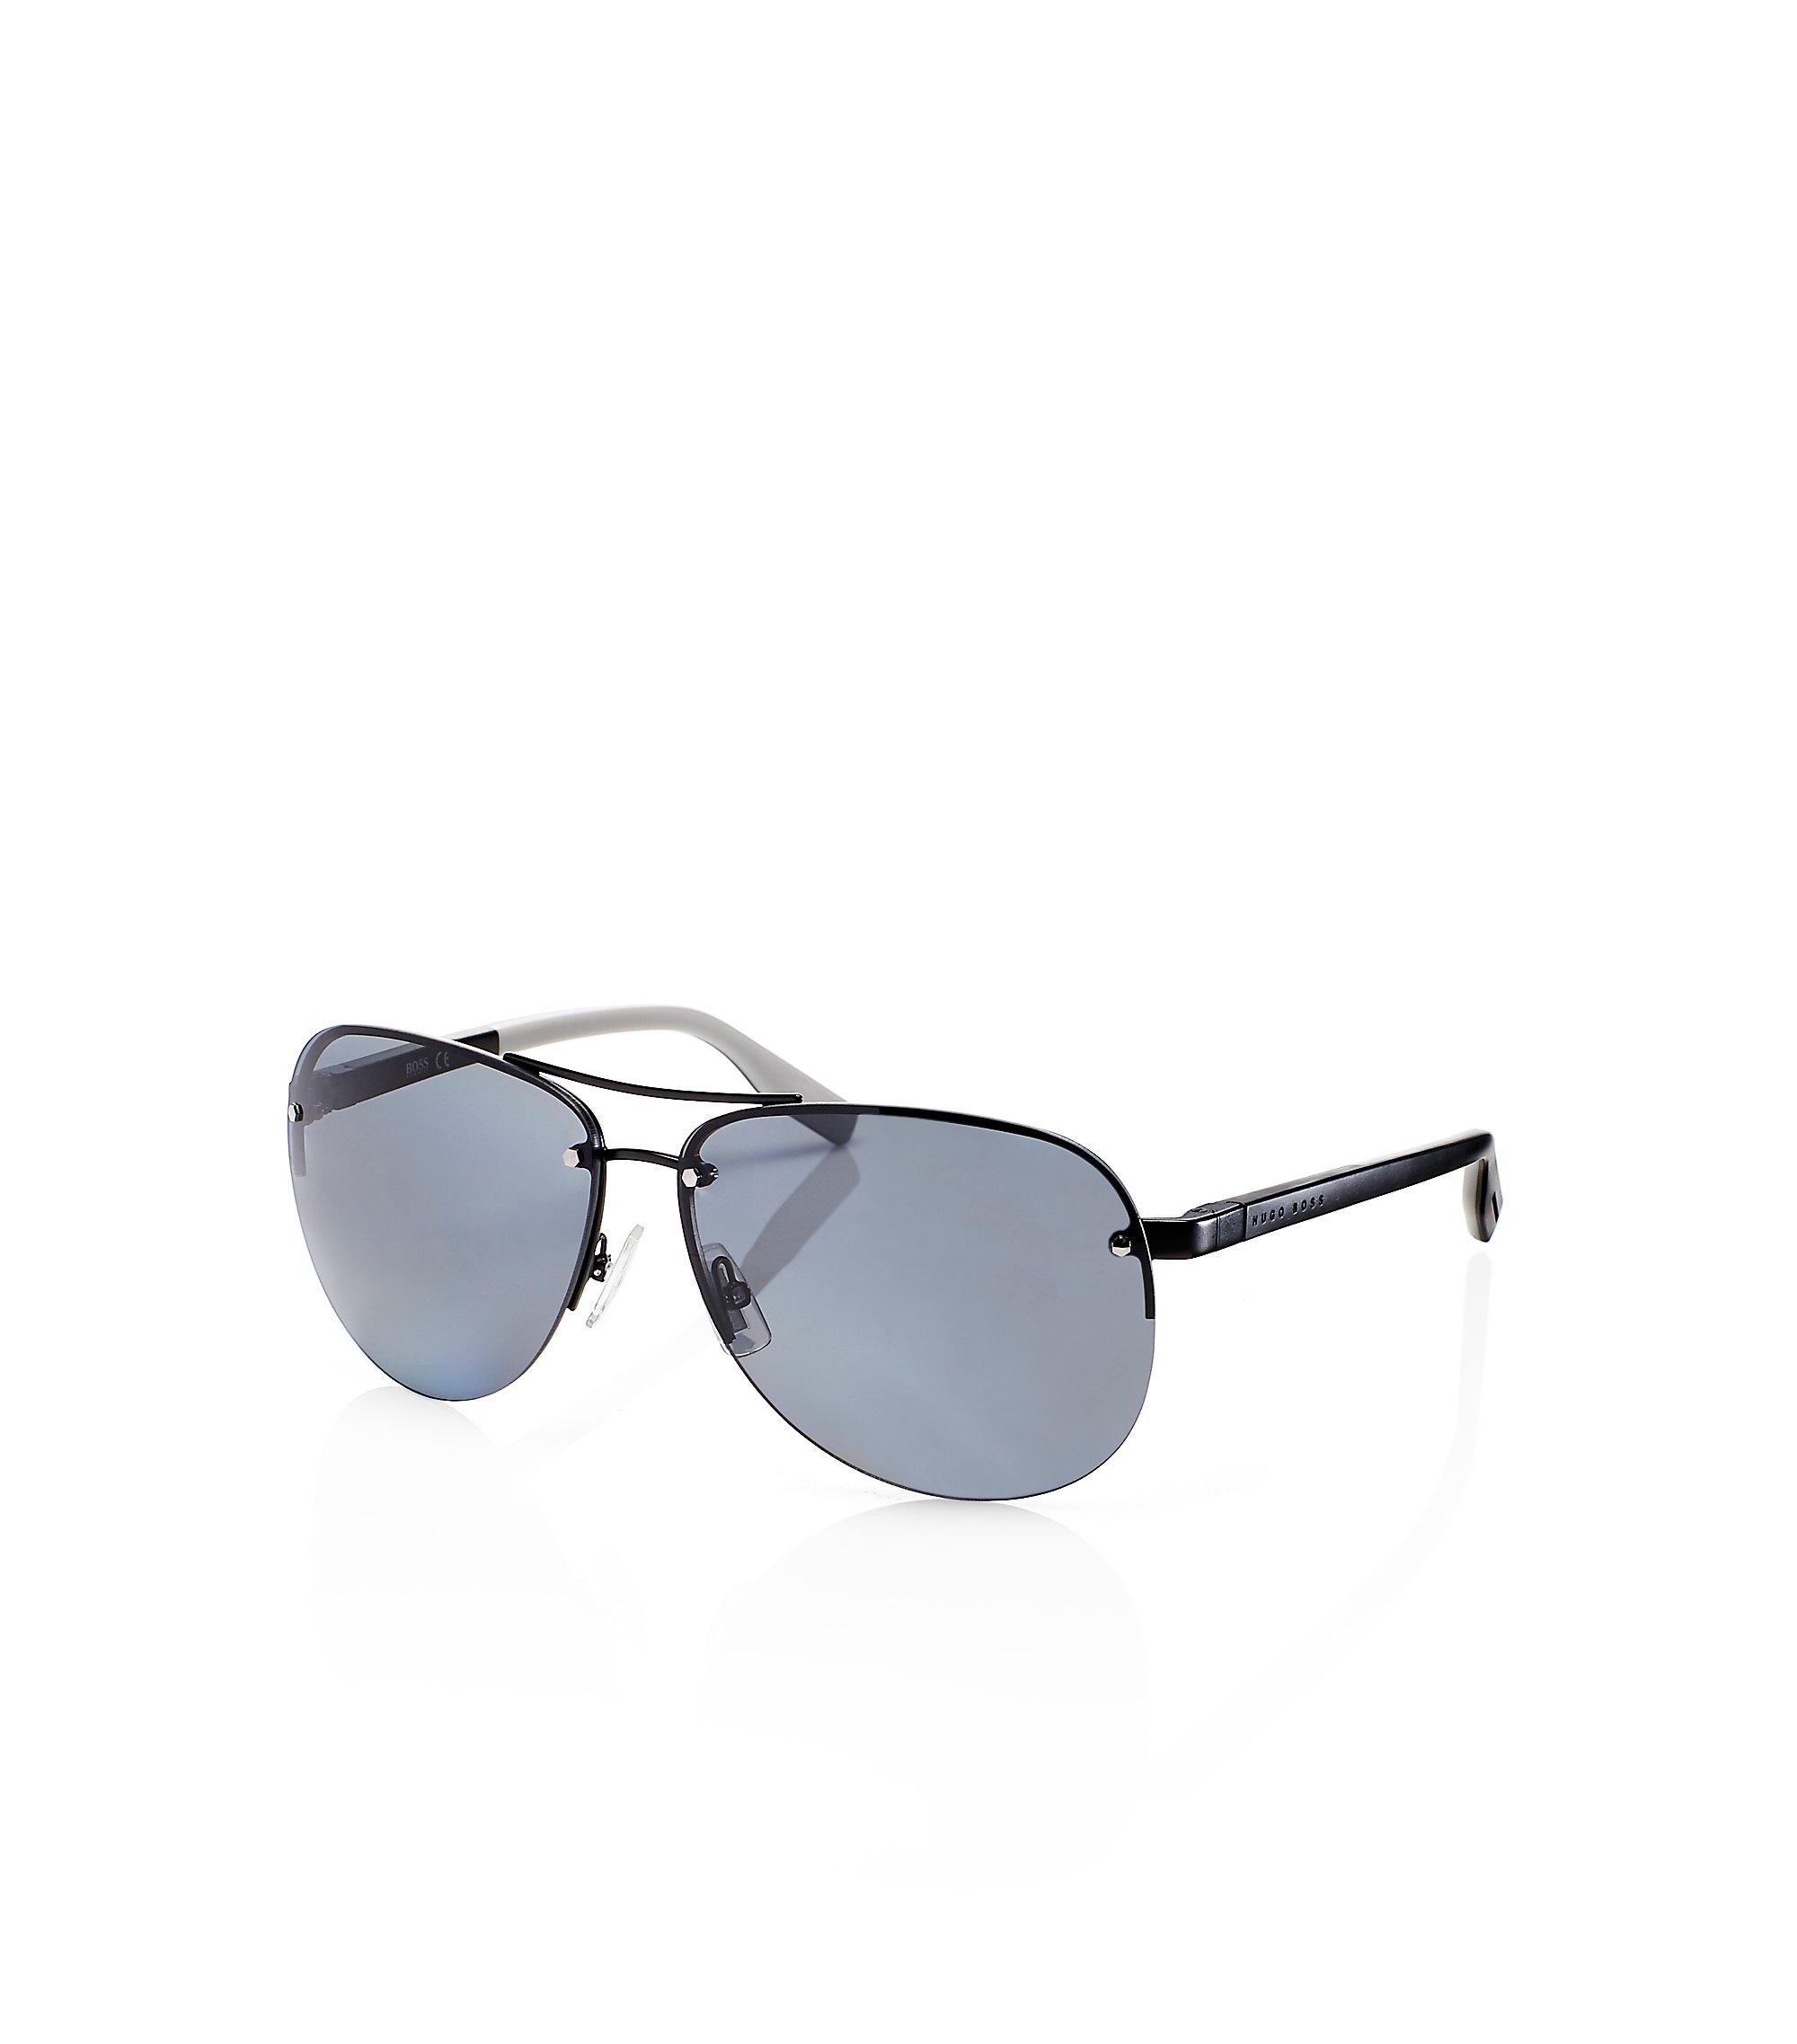 'Sunglasses'   Dark Ruthenium Rimless Aviator Sunglasses, Assorted-Pre-Pack